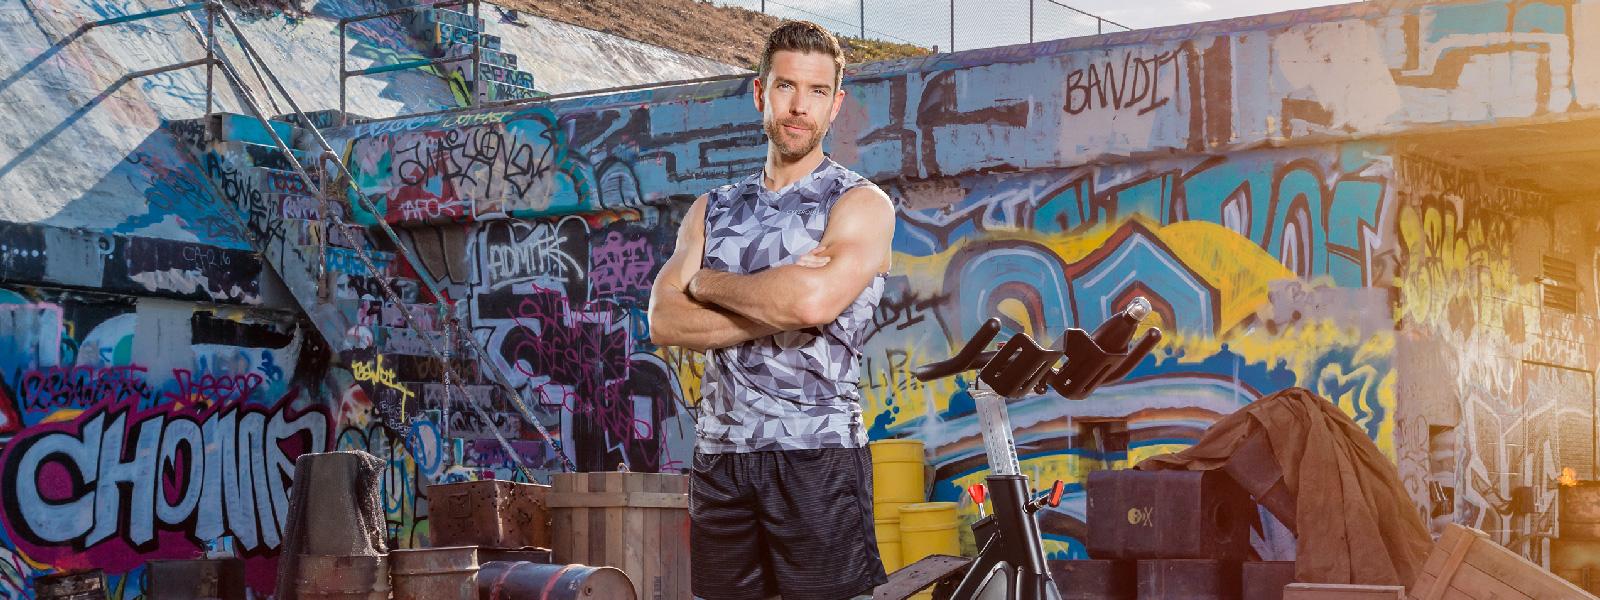 HIIT Cycling - Bronx